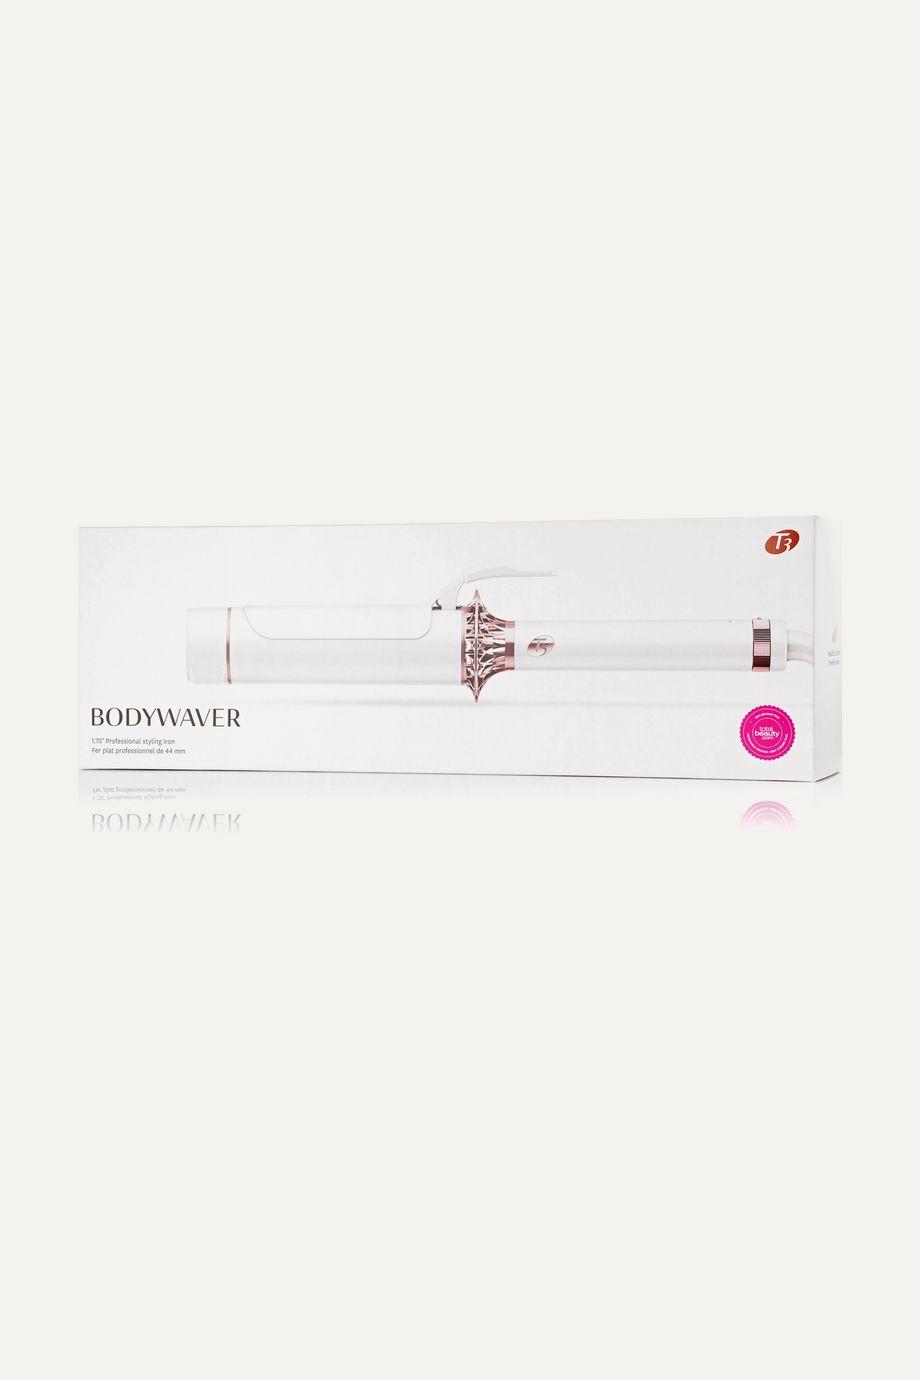 T3 BodyWaver 1.75-Inch Professional Ceramic Styling Iron - US 2-pin plug